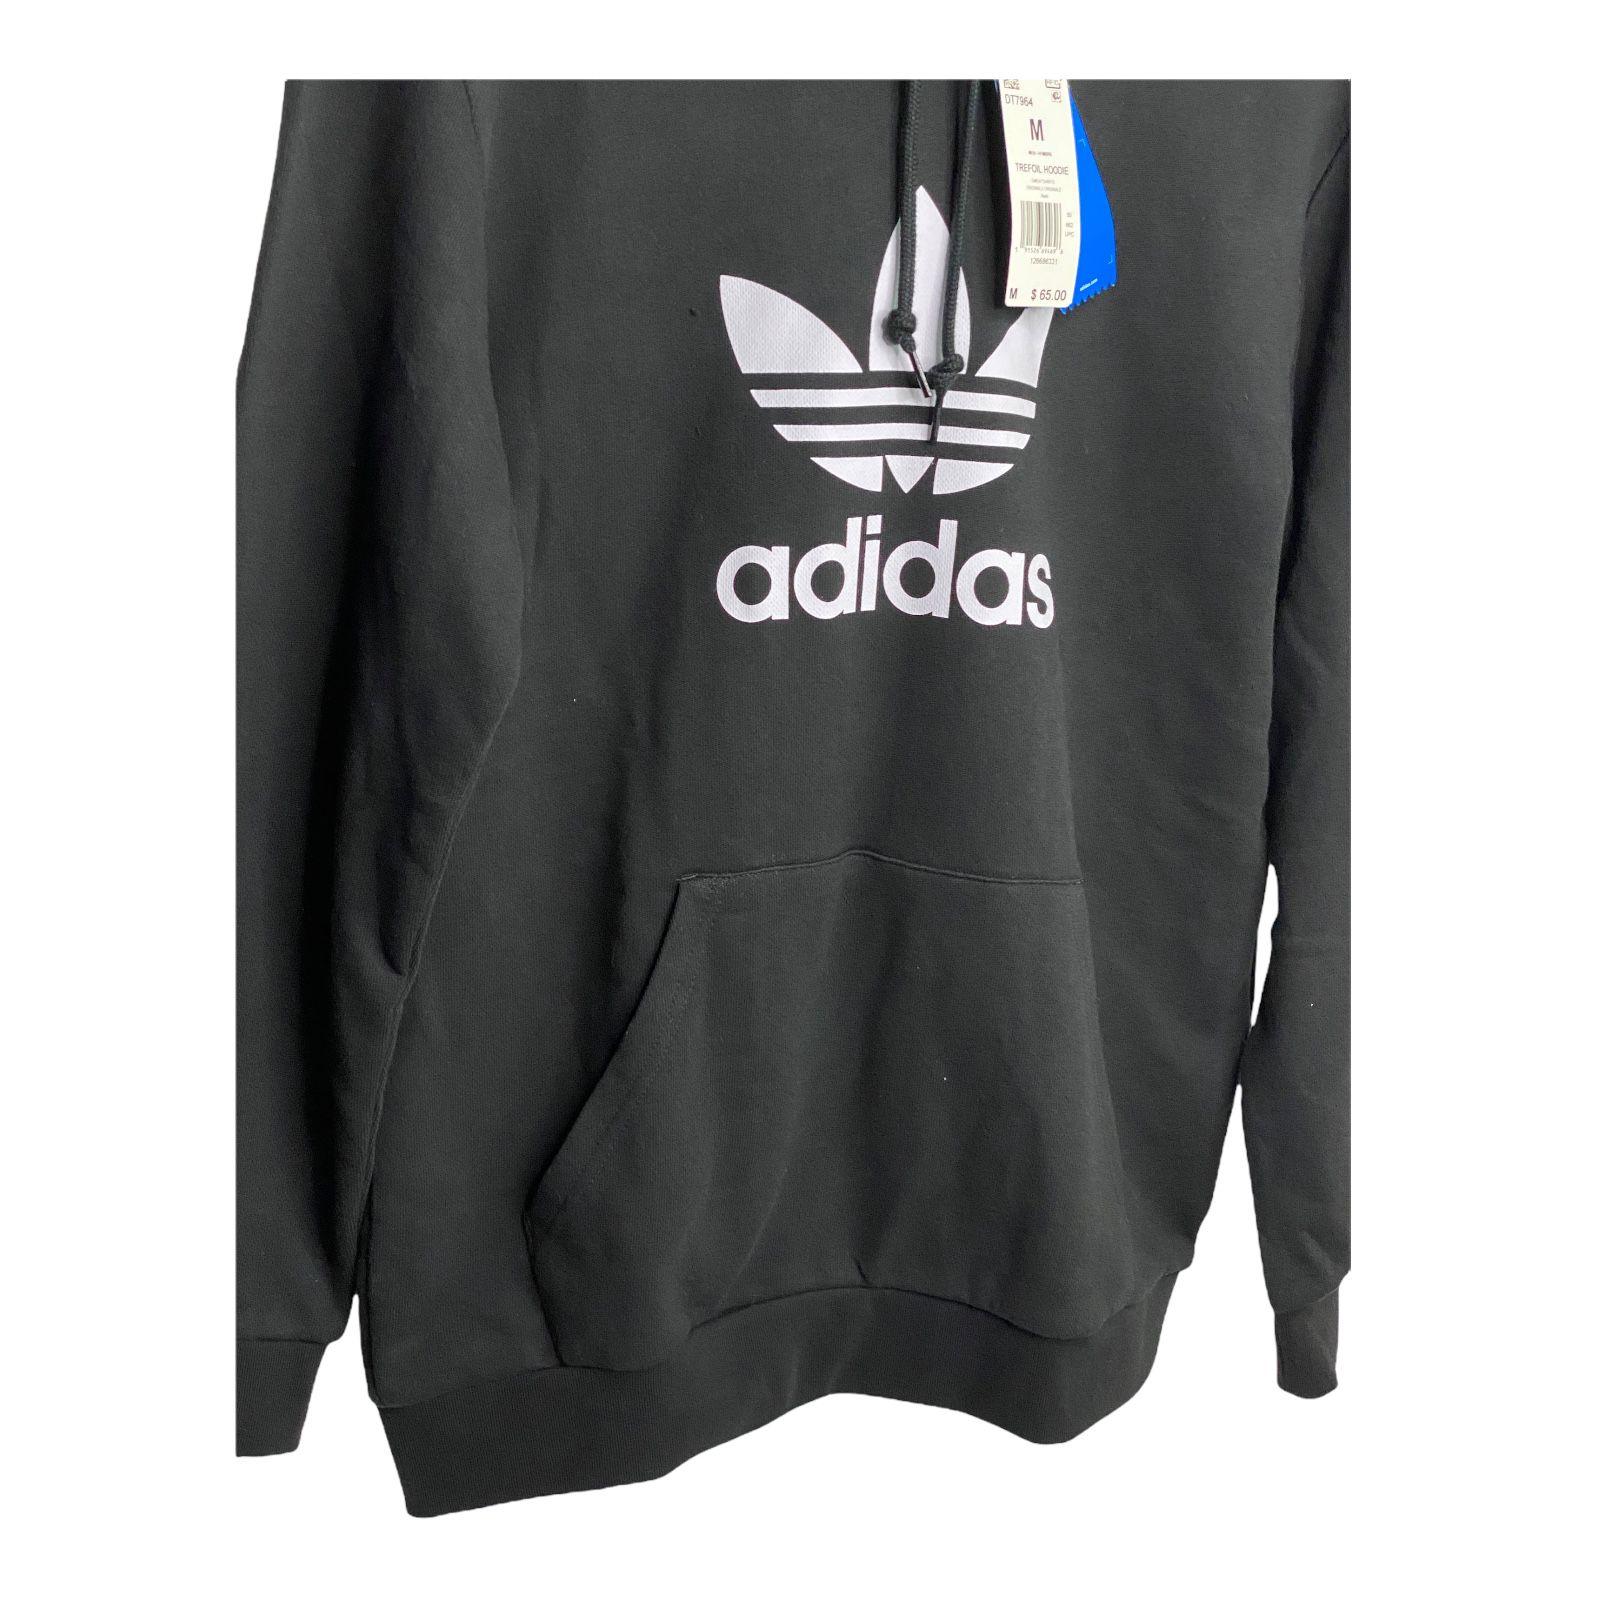 Adidas Originals Trefoil Hoodie Pullover Sz M Mens New